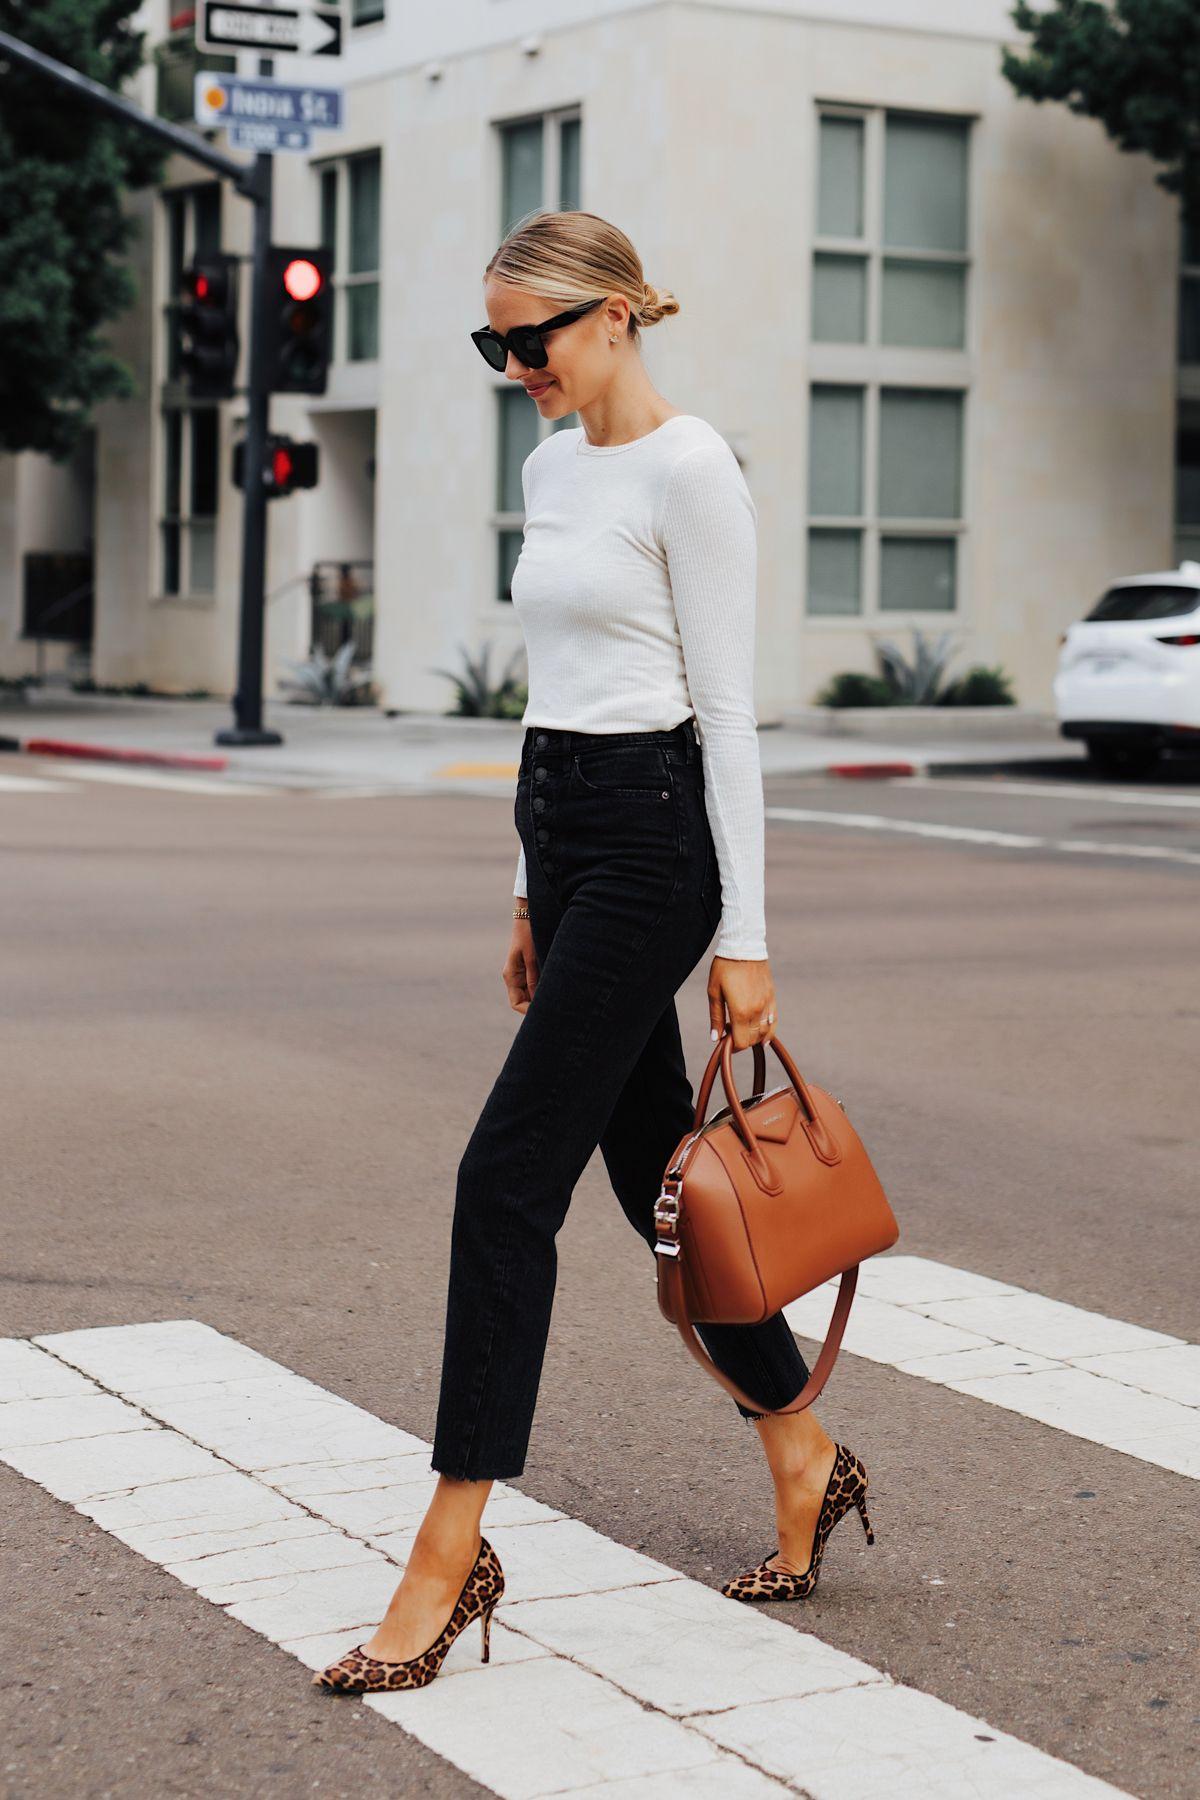 Fashion Jackson Wearing Abercrombie White Long Sleeve Top Abercrombie Raw Hem Black Jeans Leopard Pumps Givenchy Antigona Cognac Handbag